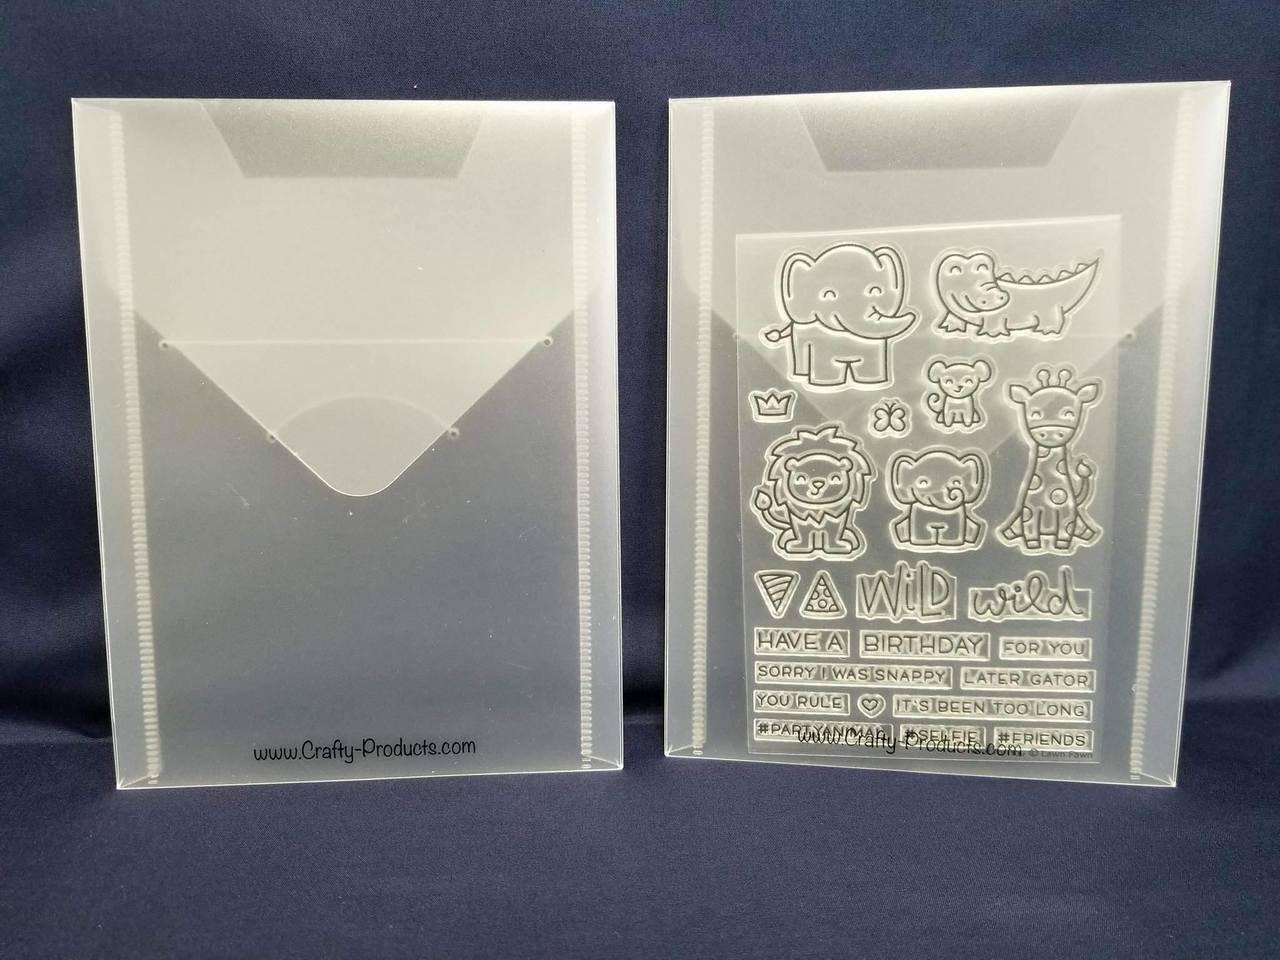 Storage Envelopes